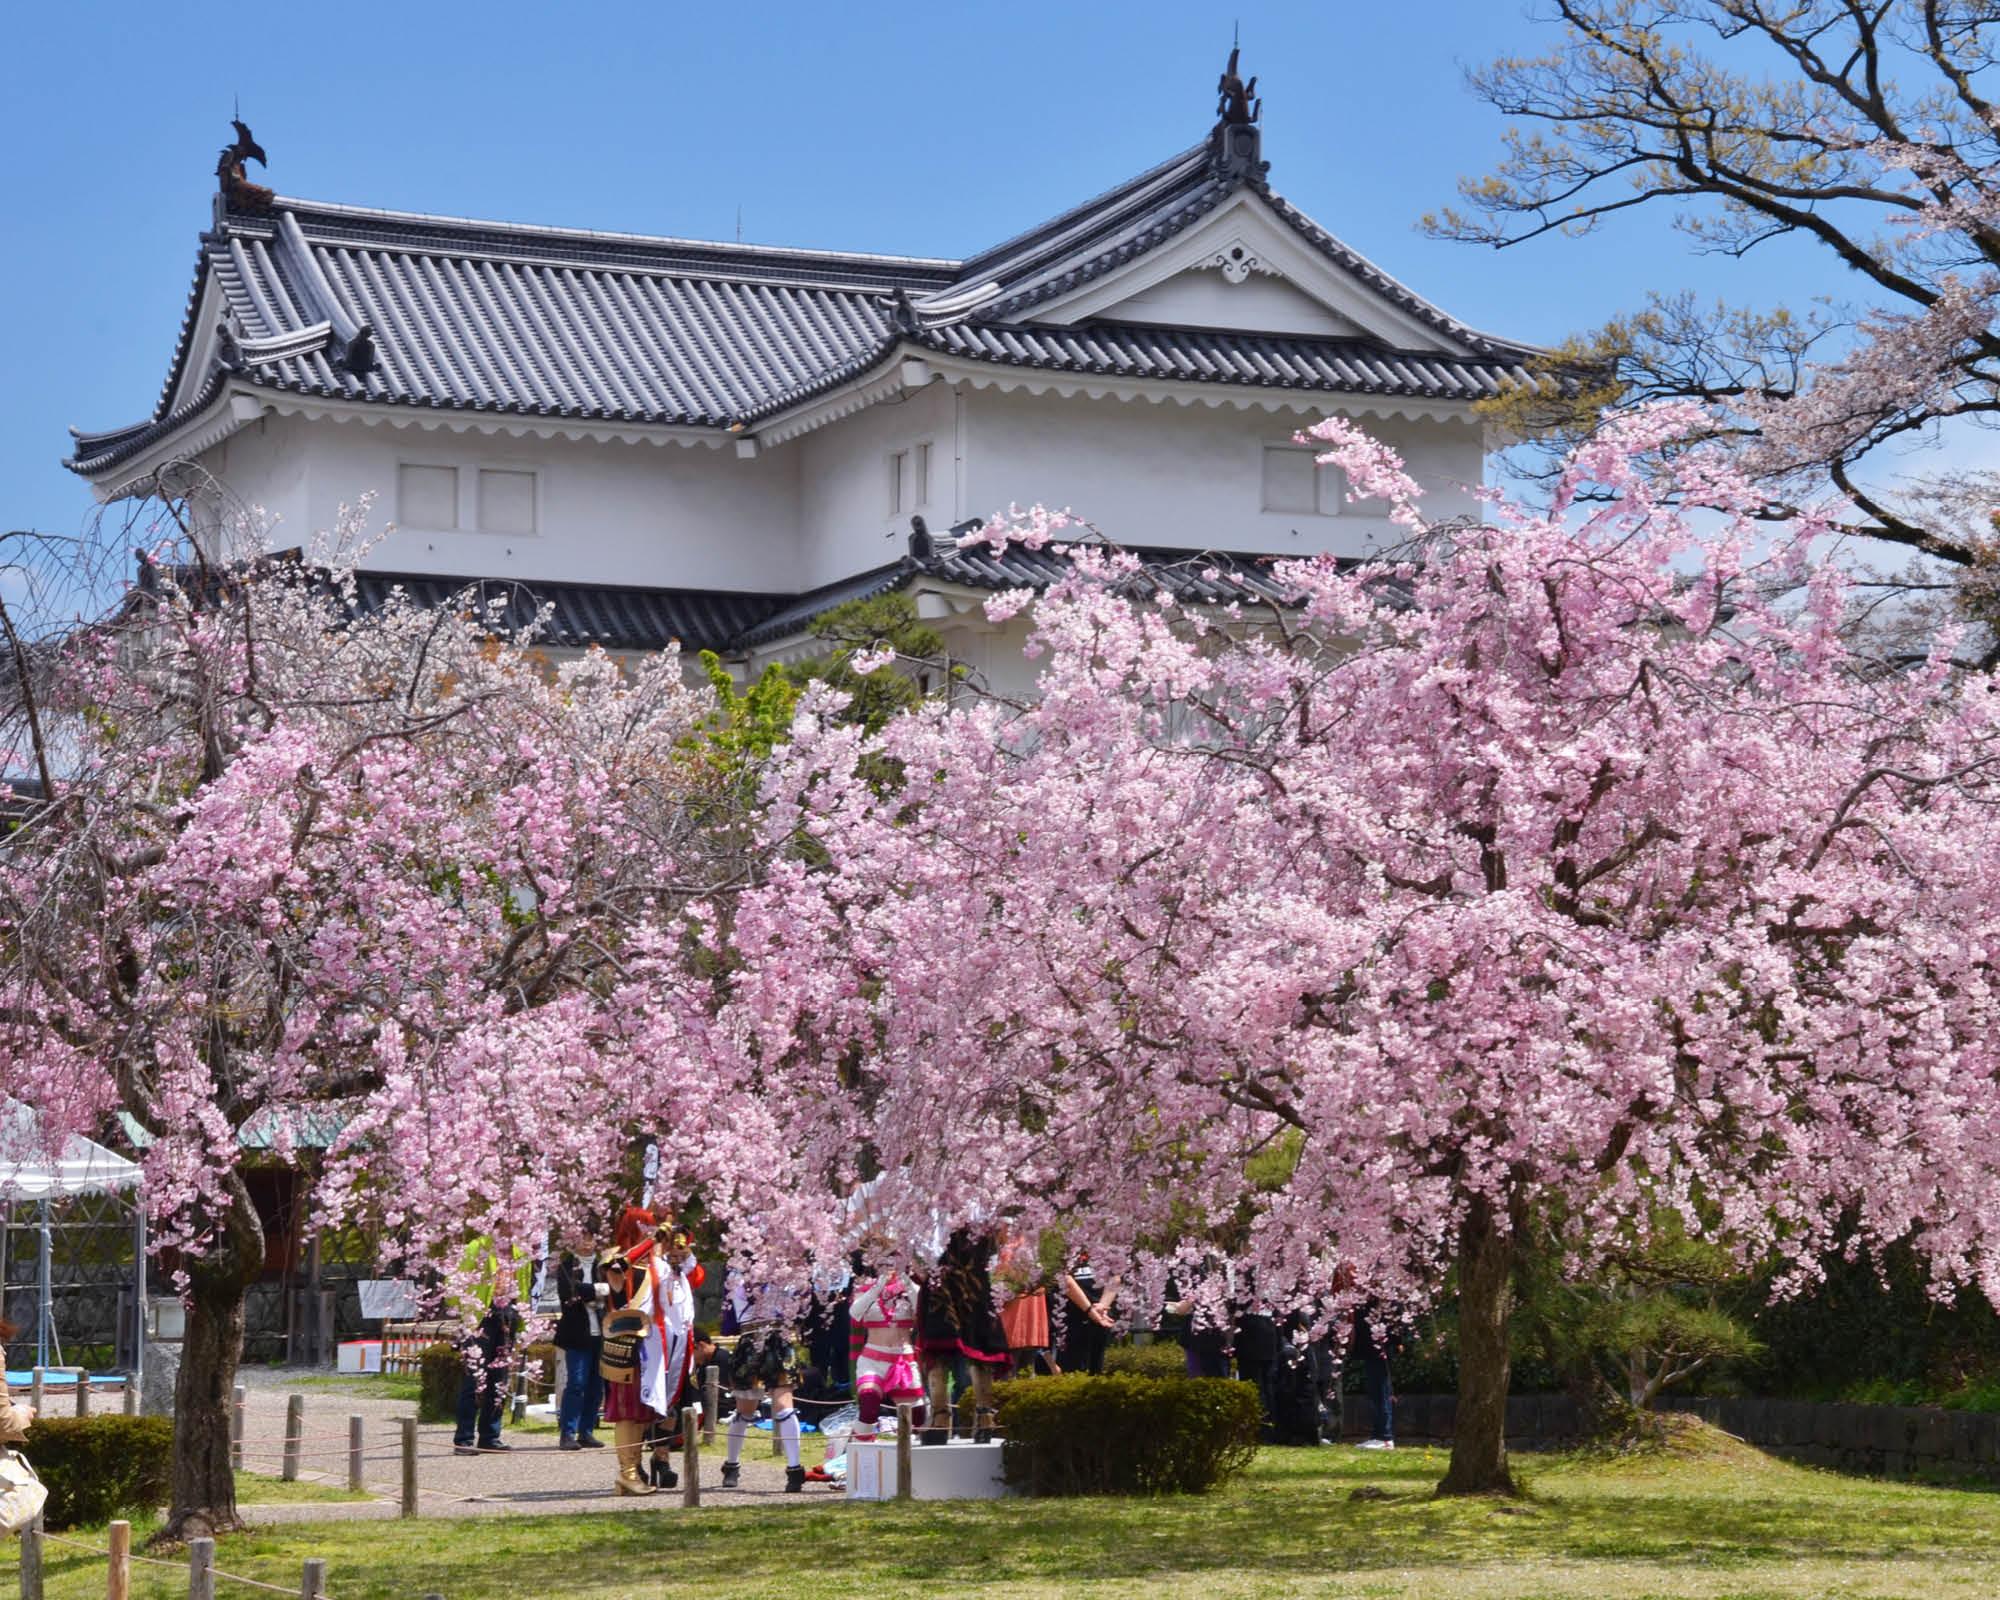 https://www.shizuoka-cb.com/wp-content/uploads/2021/03/photo-top14.jpg